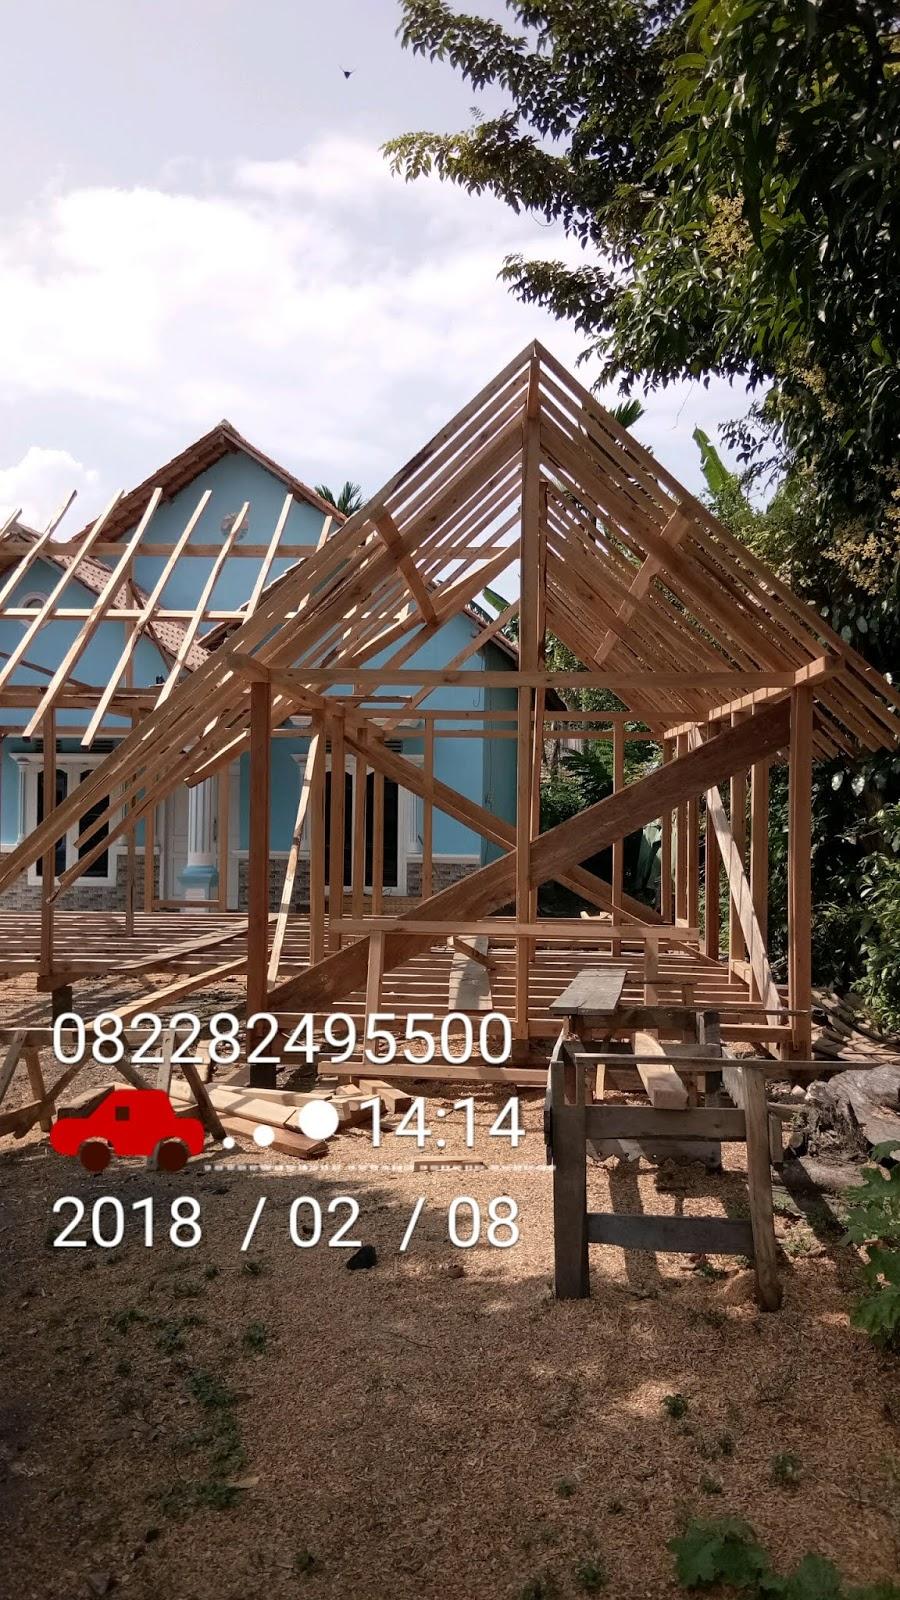 Rumah Kayu Bongkar Pasang Palembang 082282495500 Produk